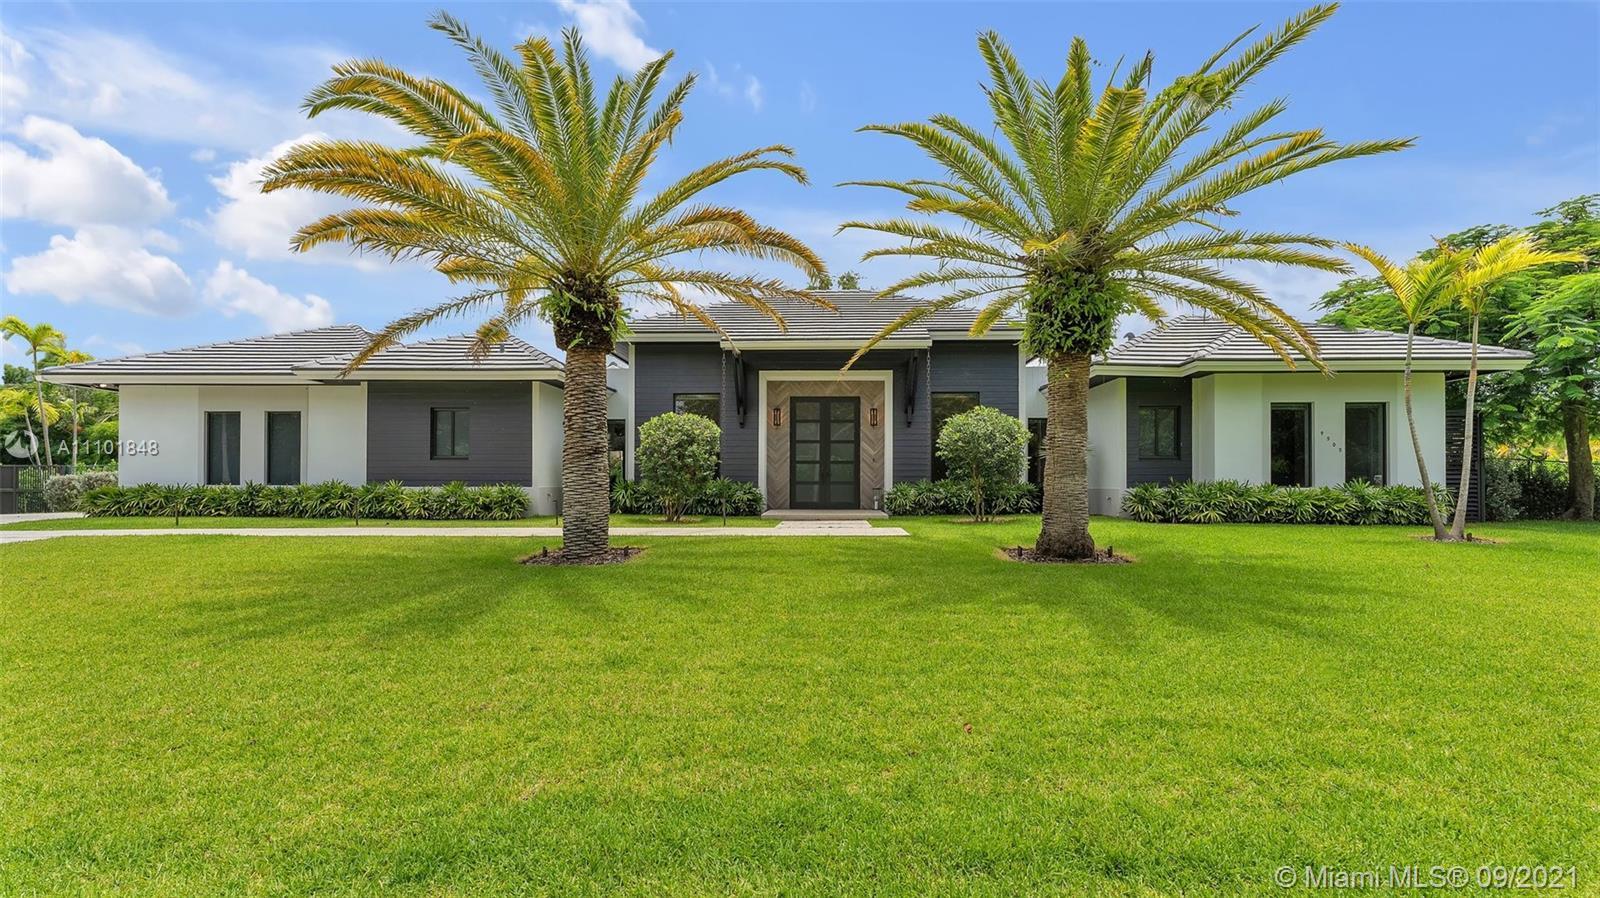 Single Family Home,For Sale,11955 SW 95 AVE, Miami, Florida 33176,Brickell,realty,broker,condos near me